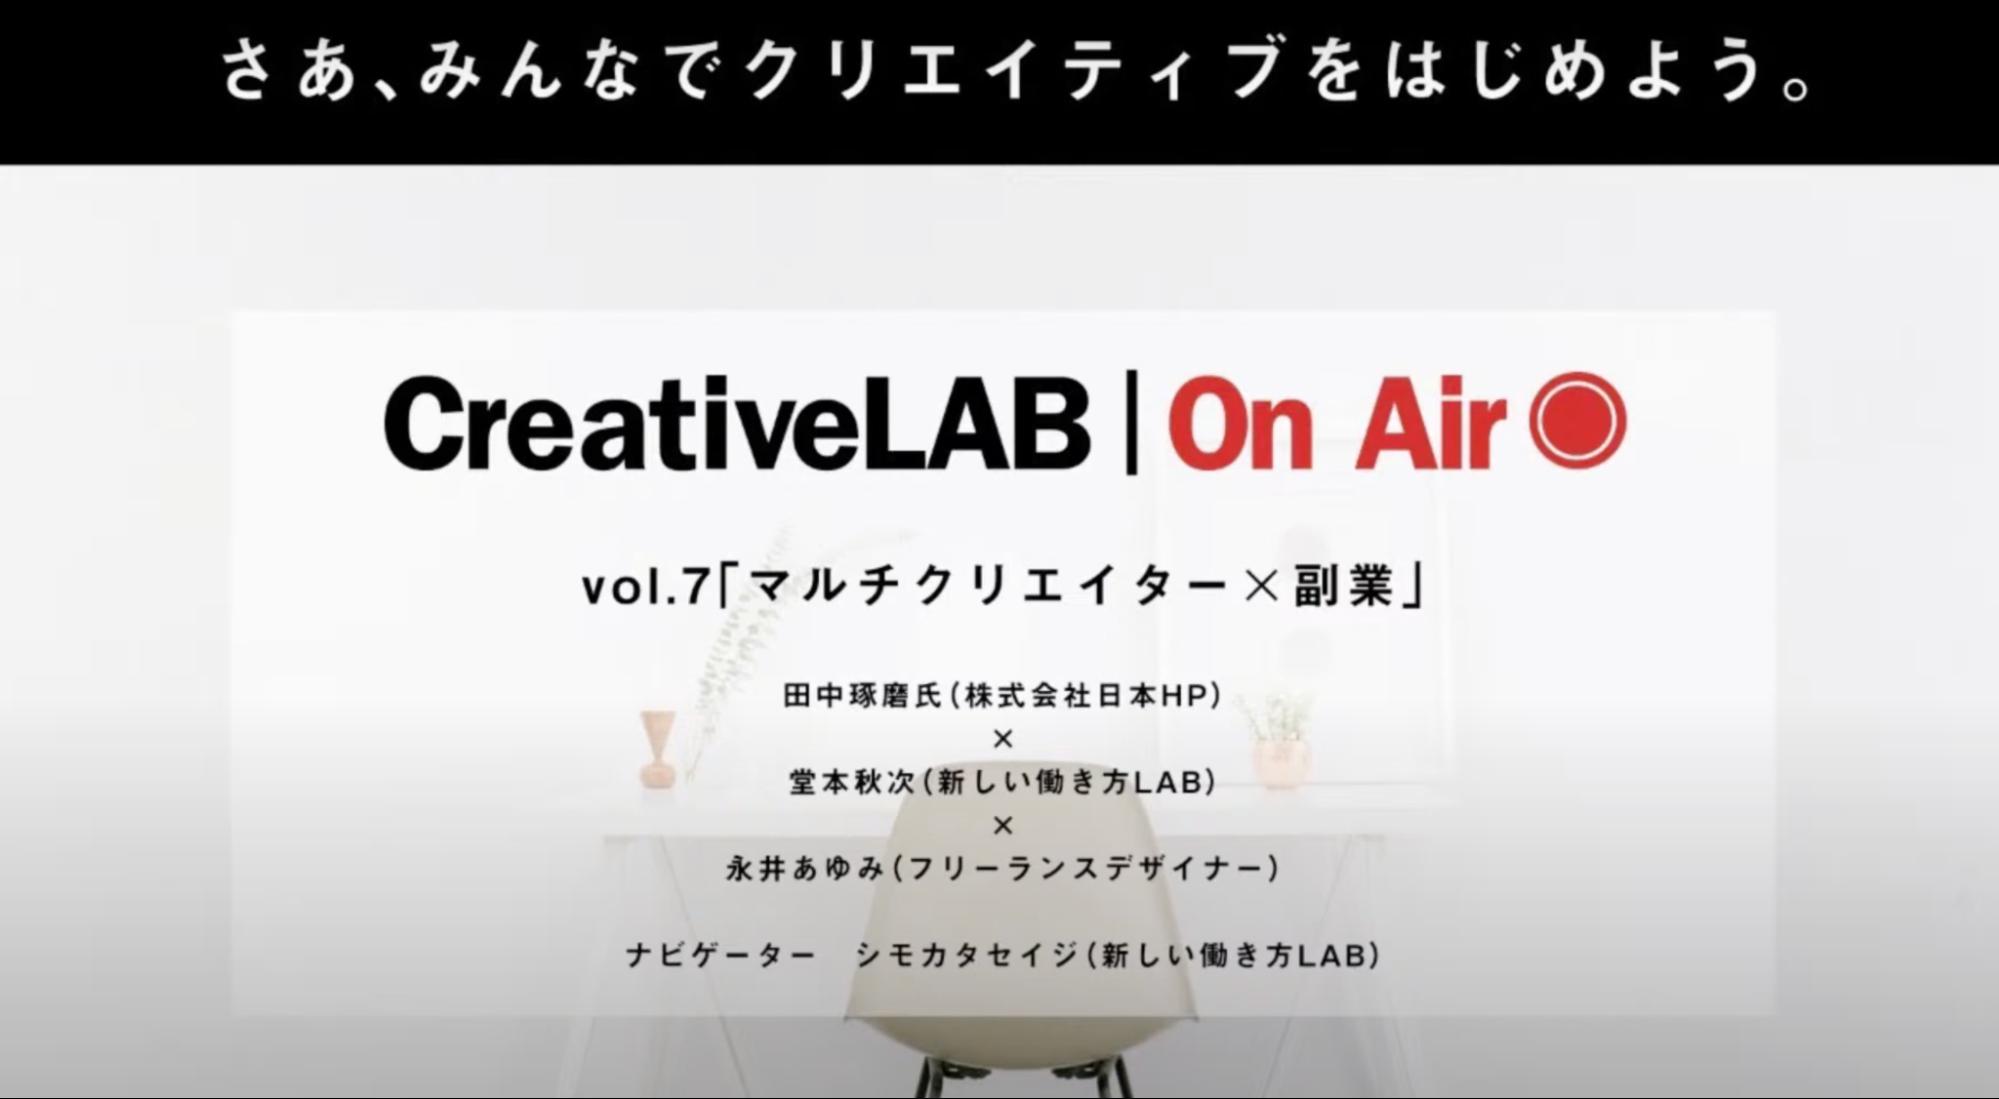 Creative LAB ❘ On Air vol.7 マルチクリエイター×副業